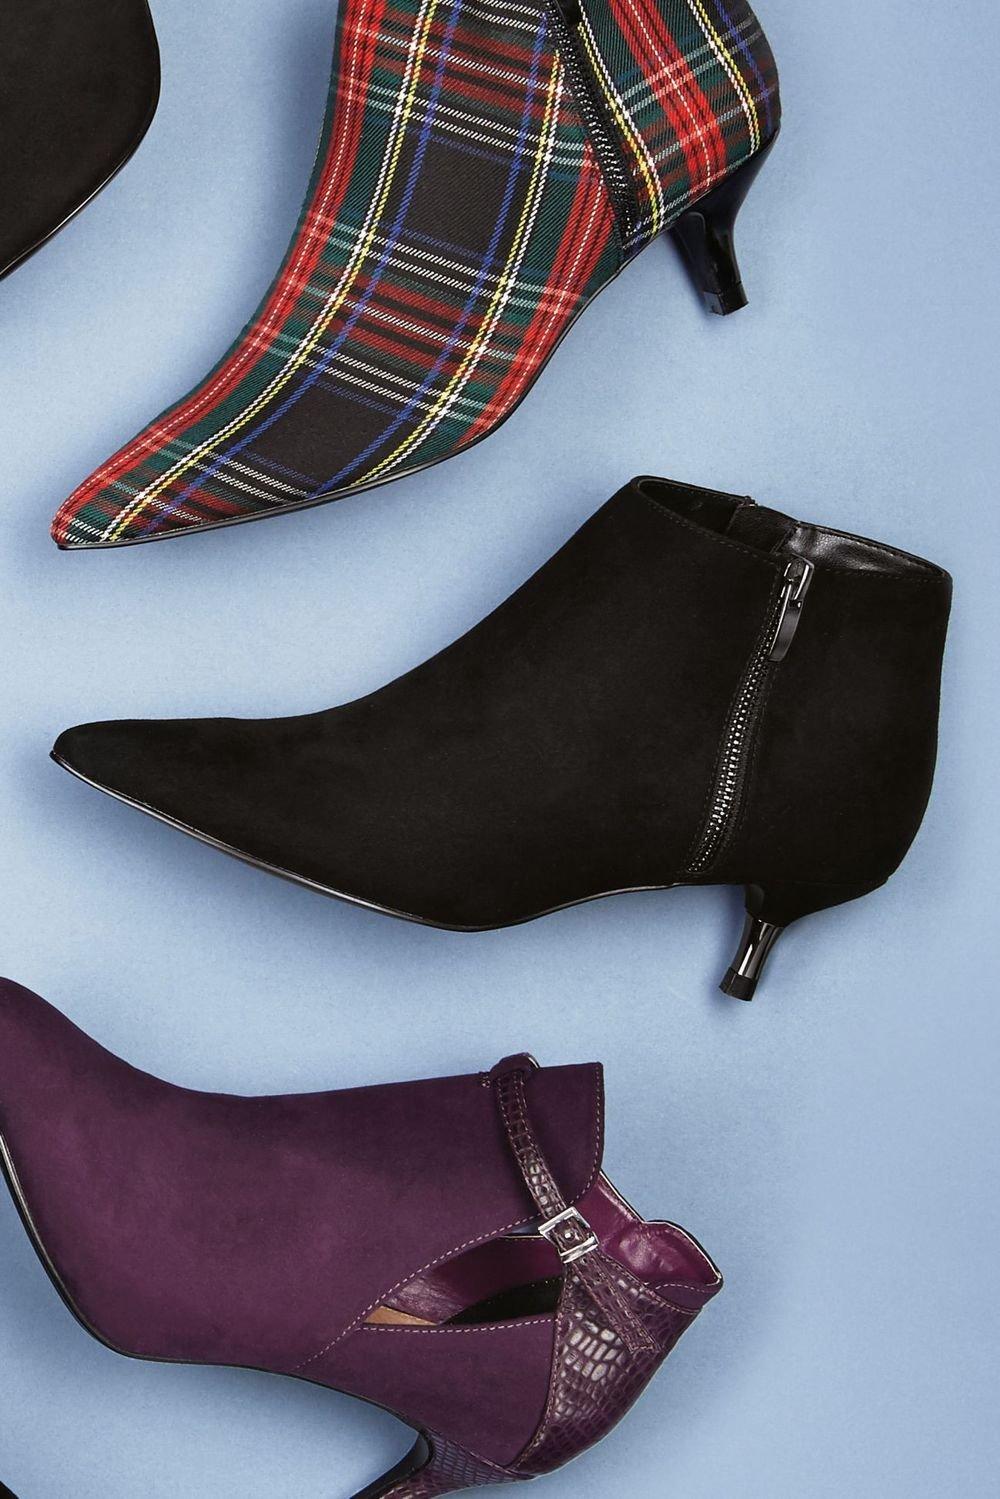 362592ba26f8 Next Kitten Heel Ankle Boots Online